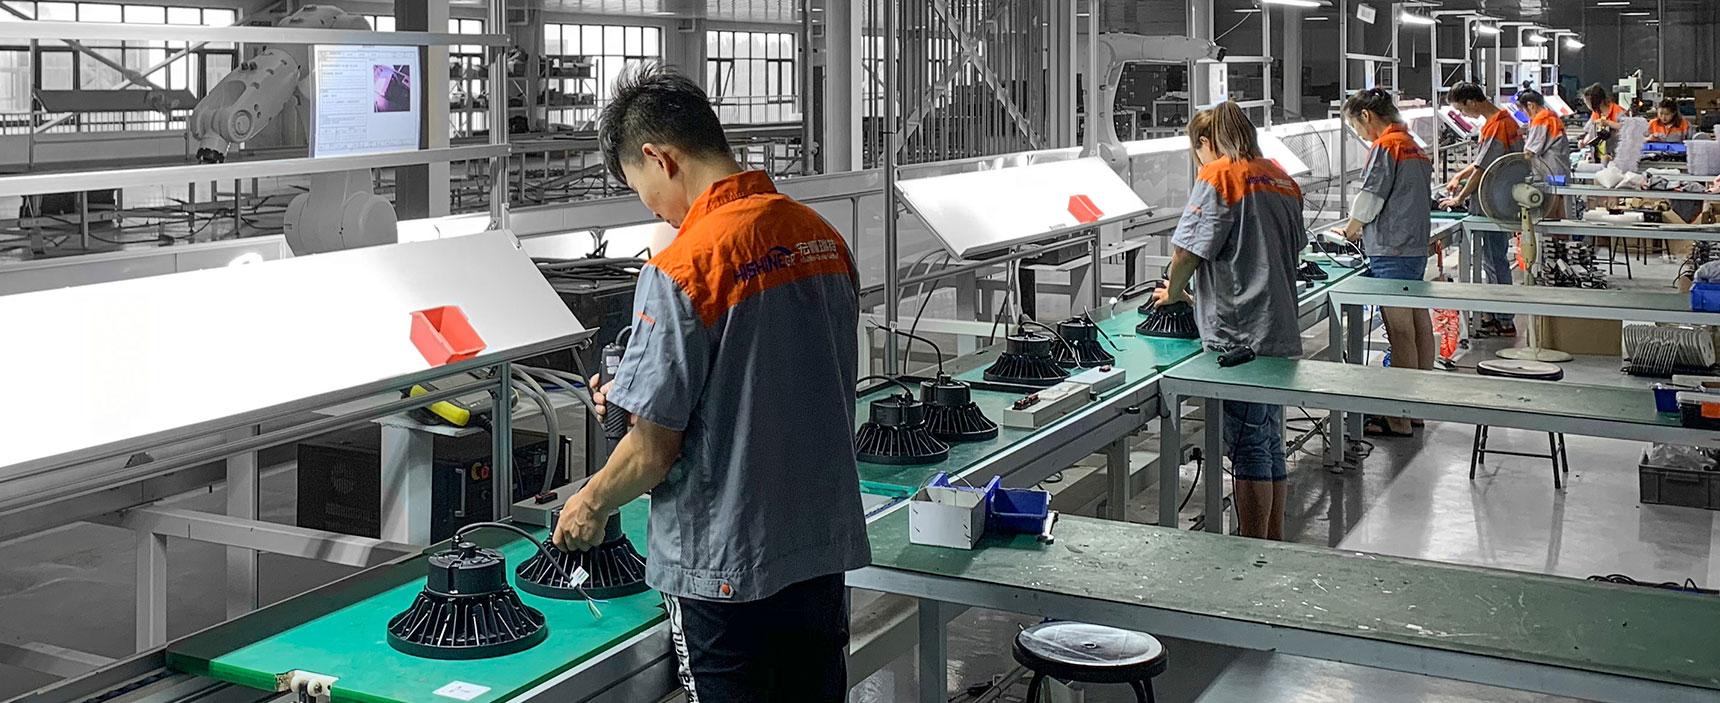 Automatic-production-line